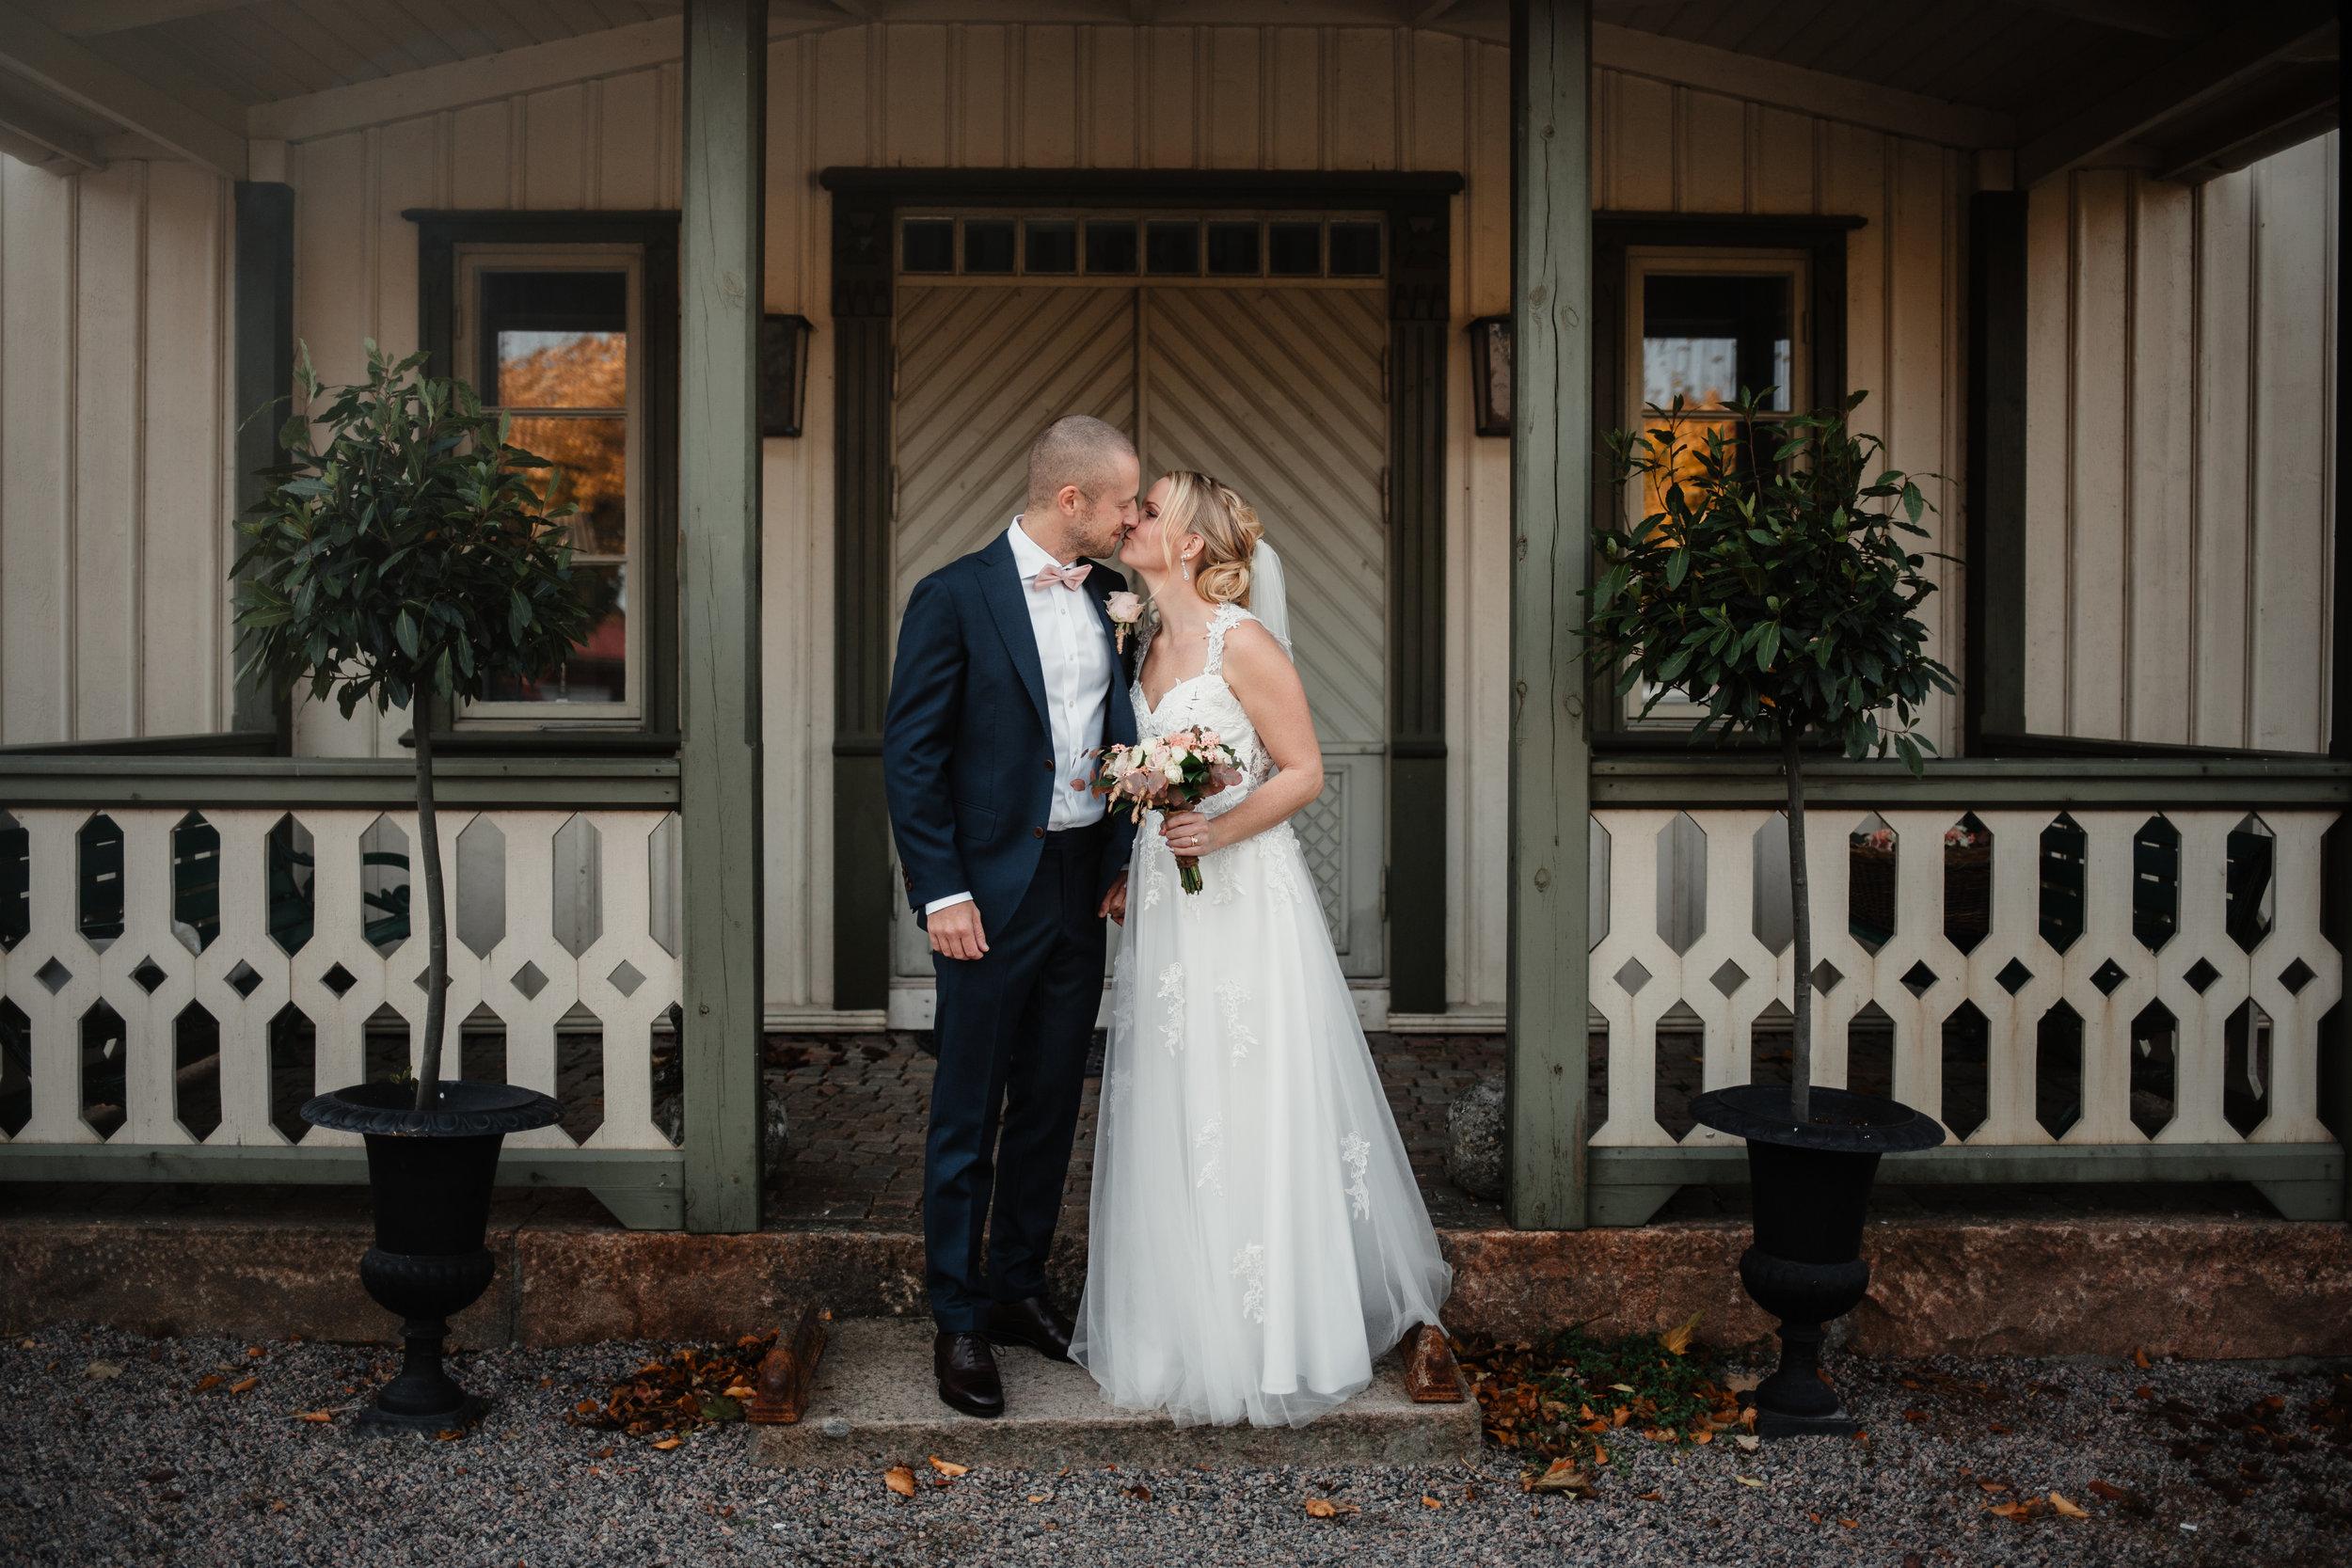 Bröllopsfotograf-Uddetorp Säteri-Höstbröllop-Fotograf Emilia- Bröllopsfotograf Borås-16.jpg